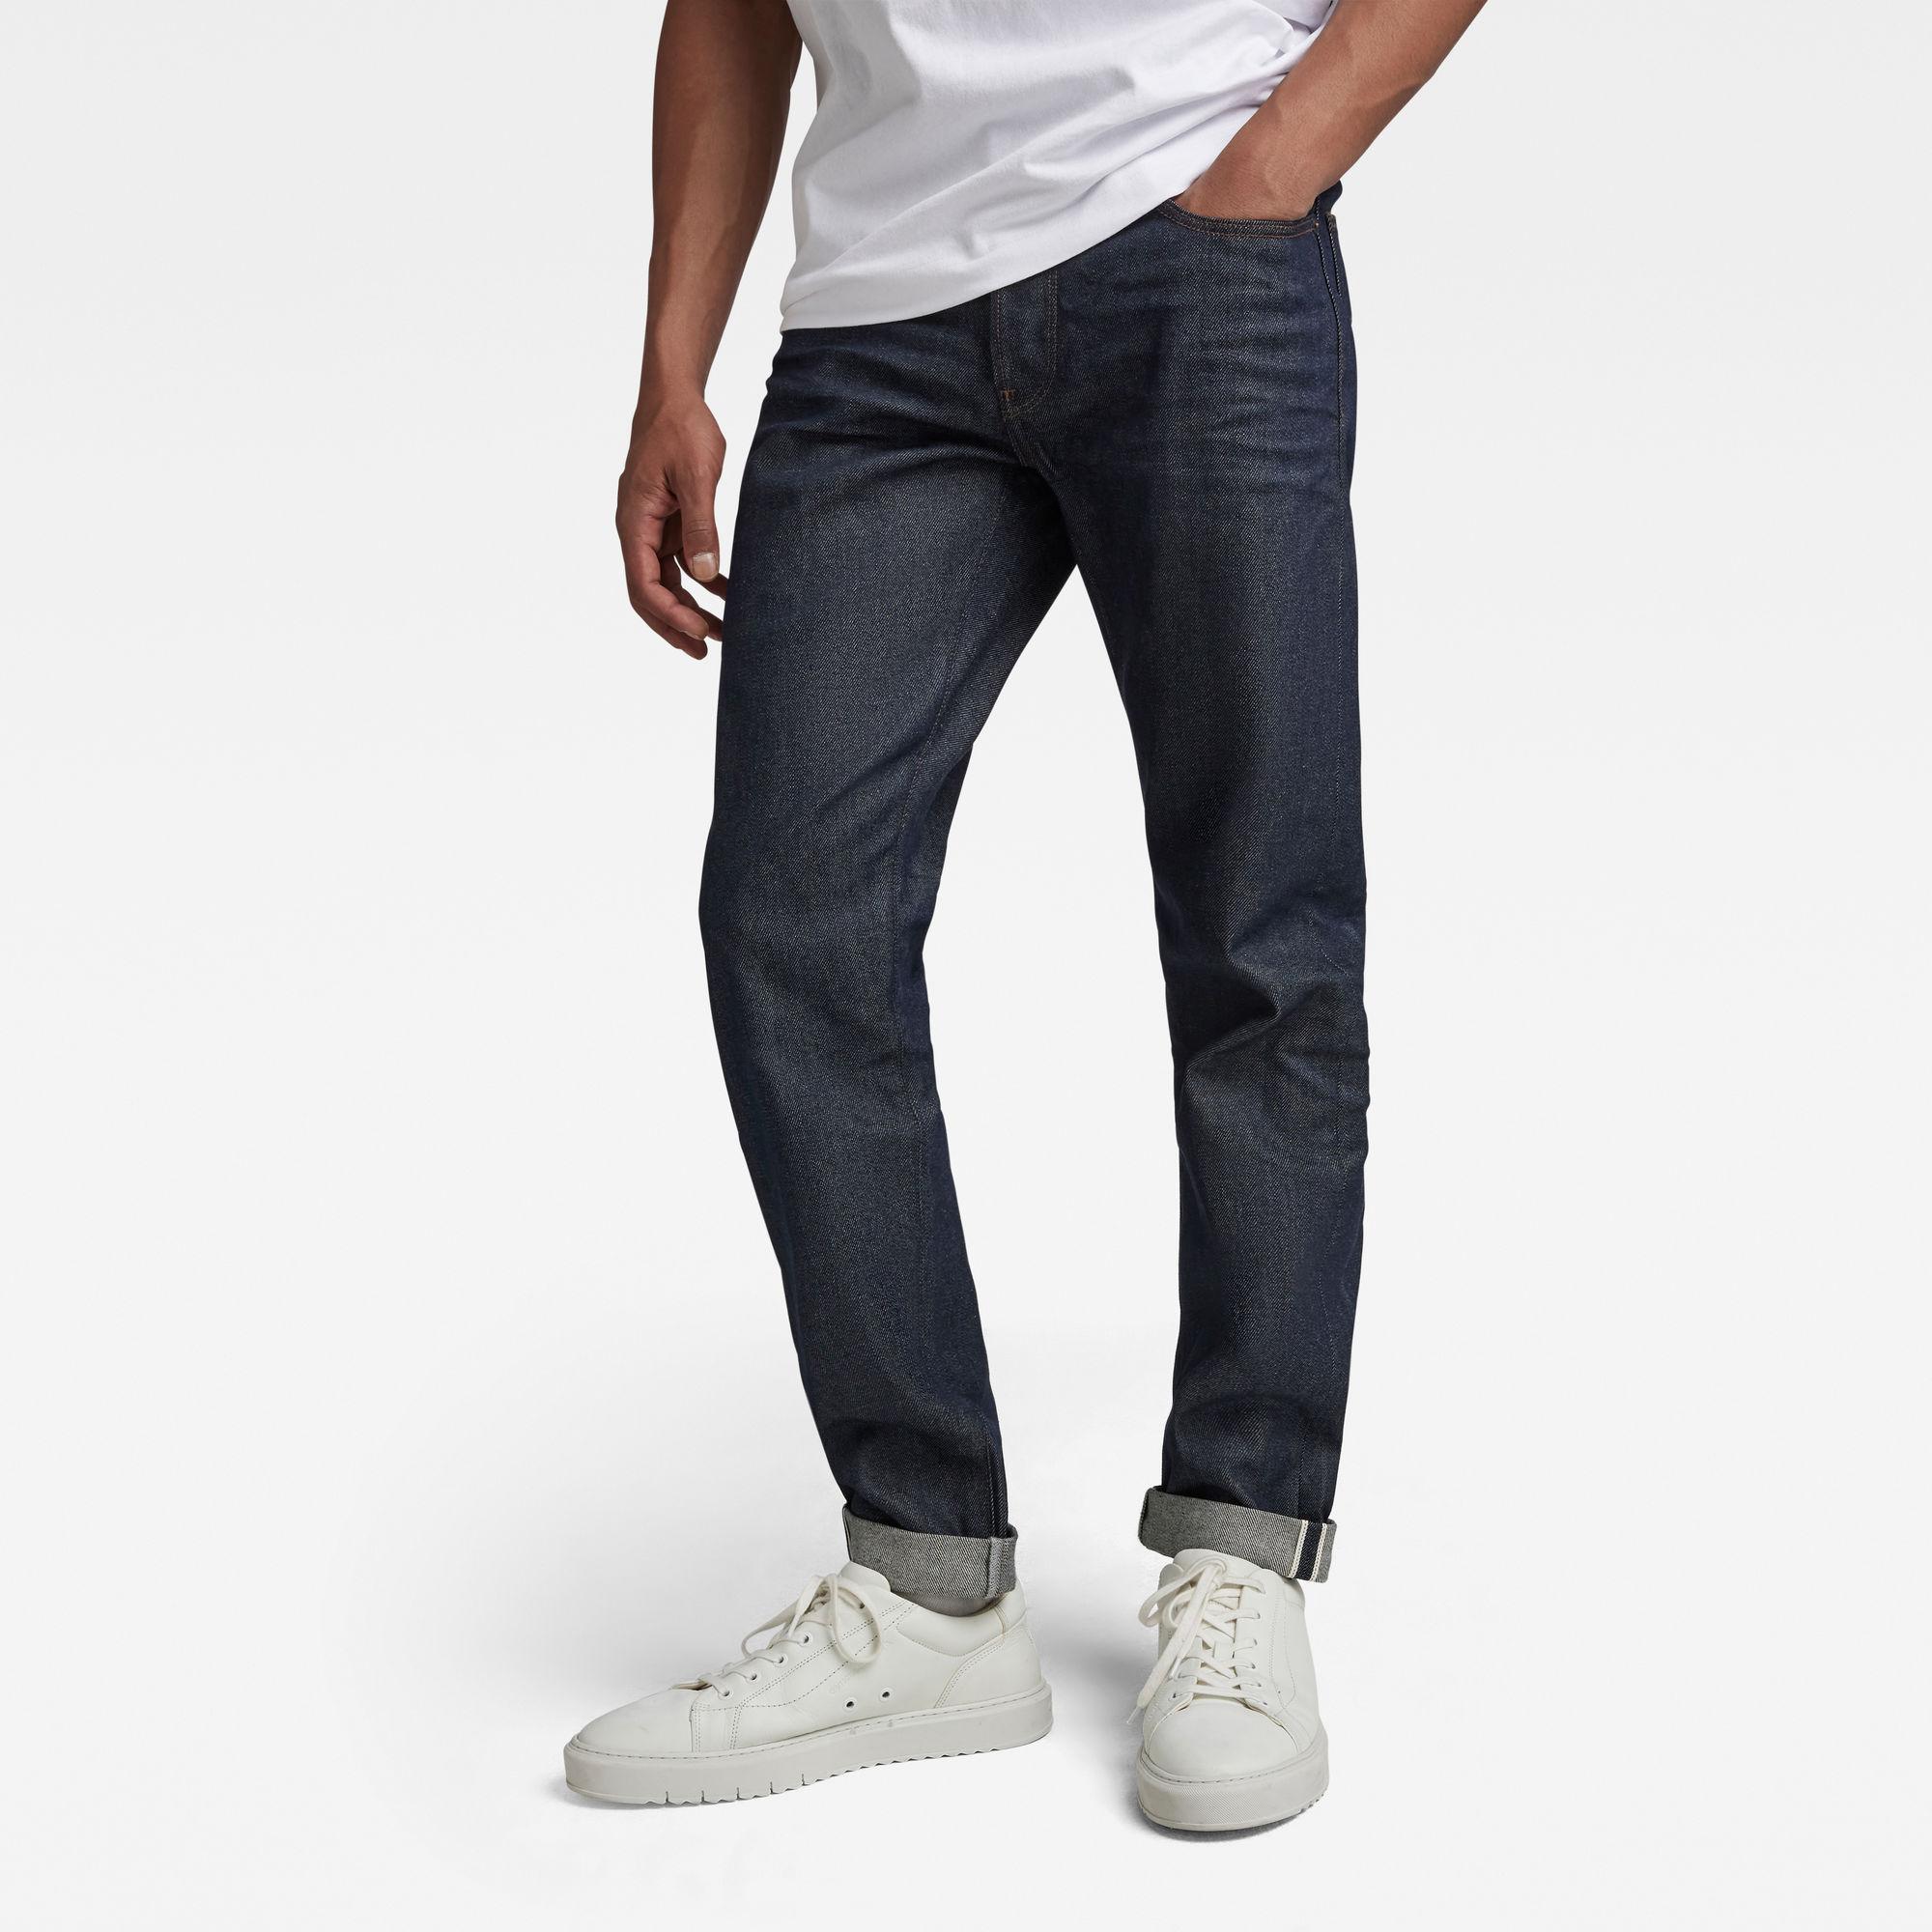 G-Star RAW Heren 3301 Slim Selvedge Jeans Donkerblauw